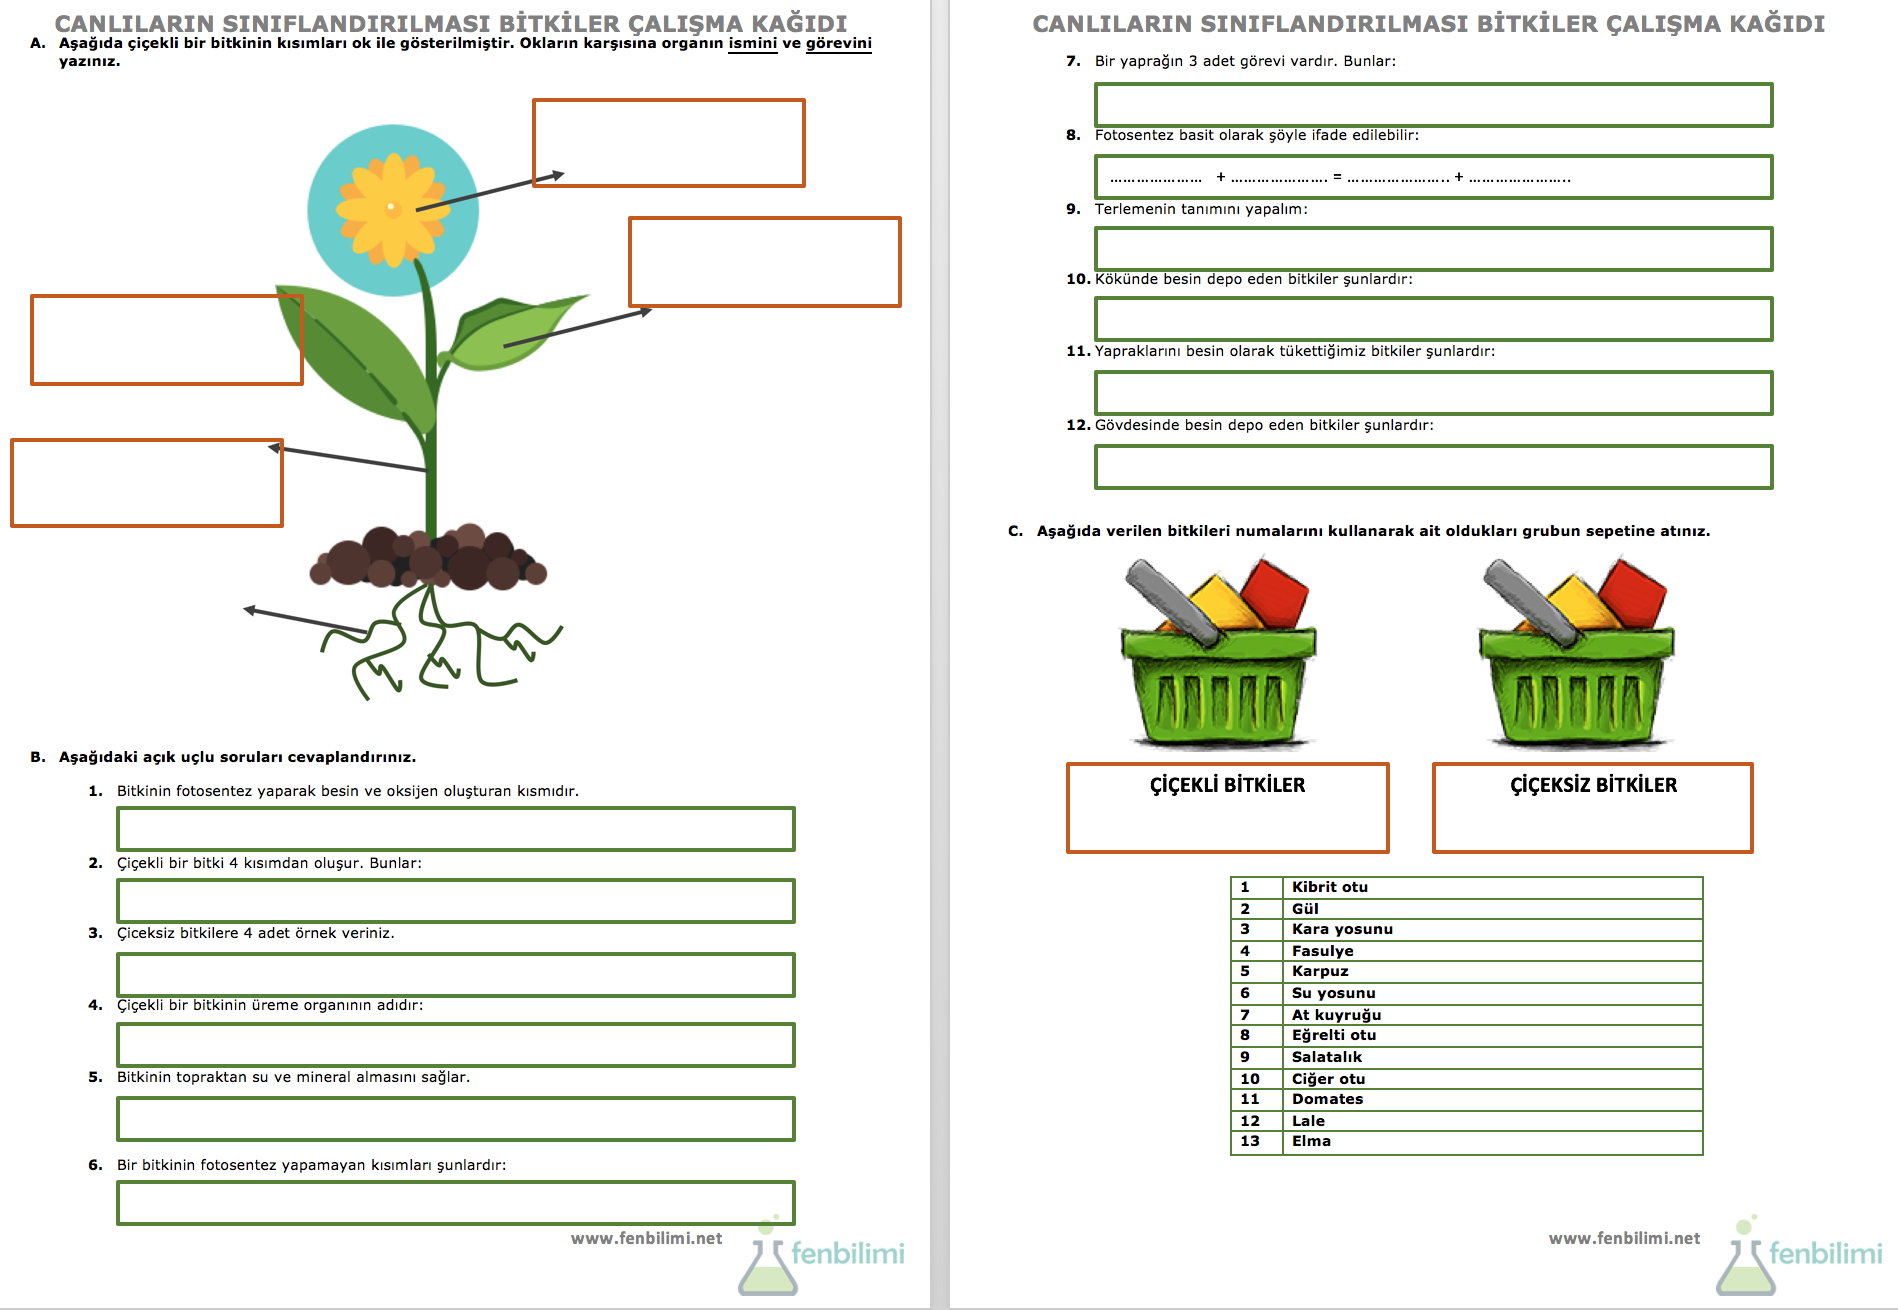 Canlilarin Siniflandirilmasi Bitkiler Calisma Kagidi Fenbilimi